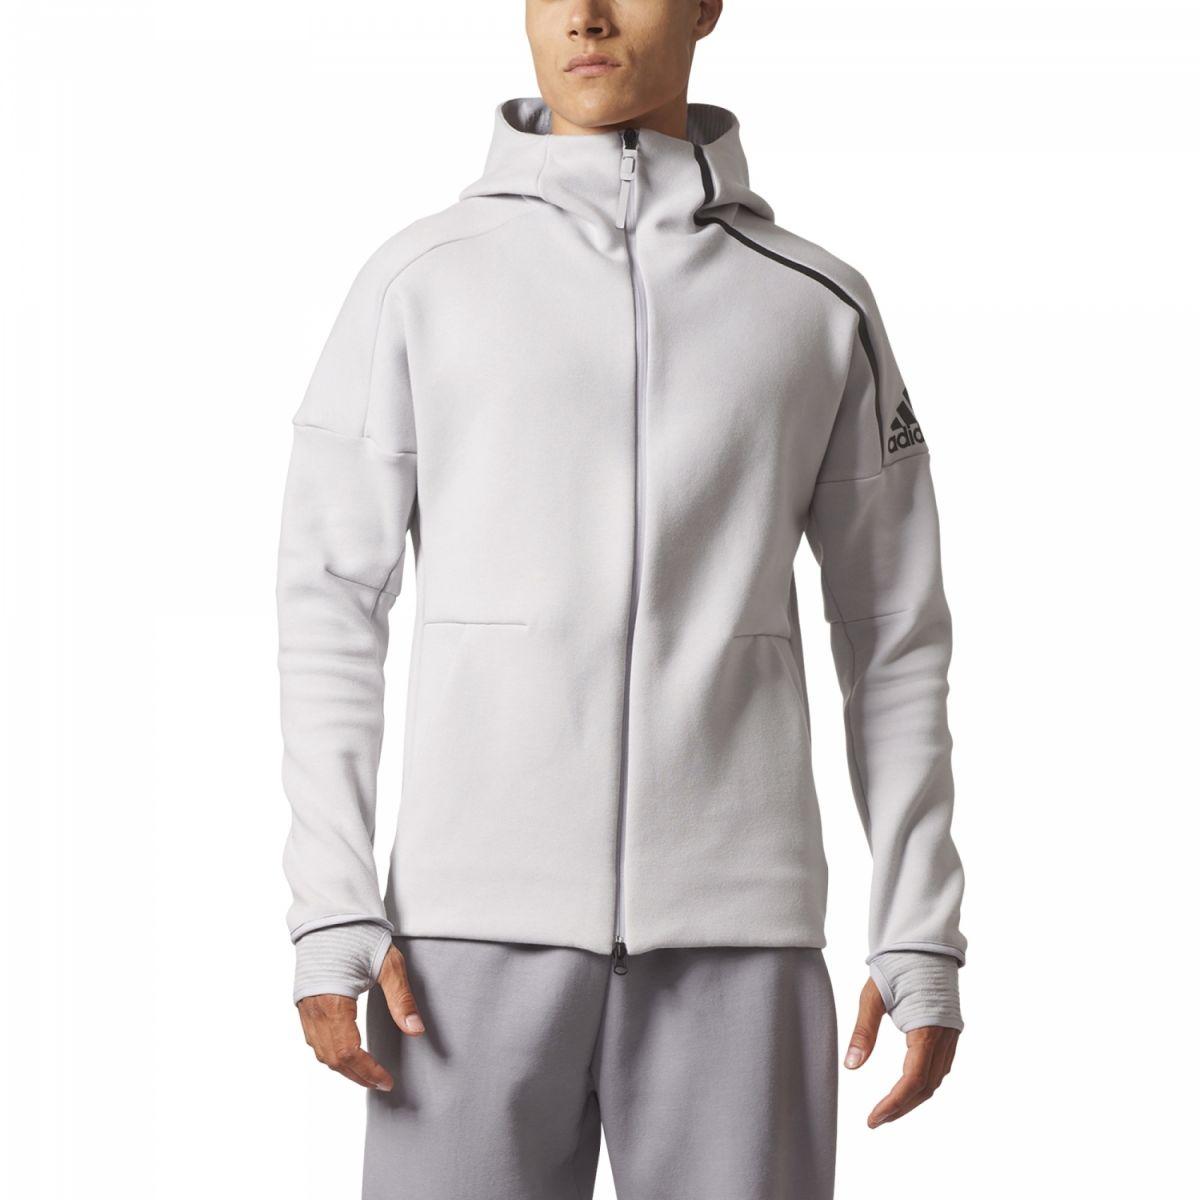 adidas zne hoodie pulse herren kapuzenjacke grau bq0074. Black Bedroom Furniture Sets. Home Design Ideas